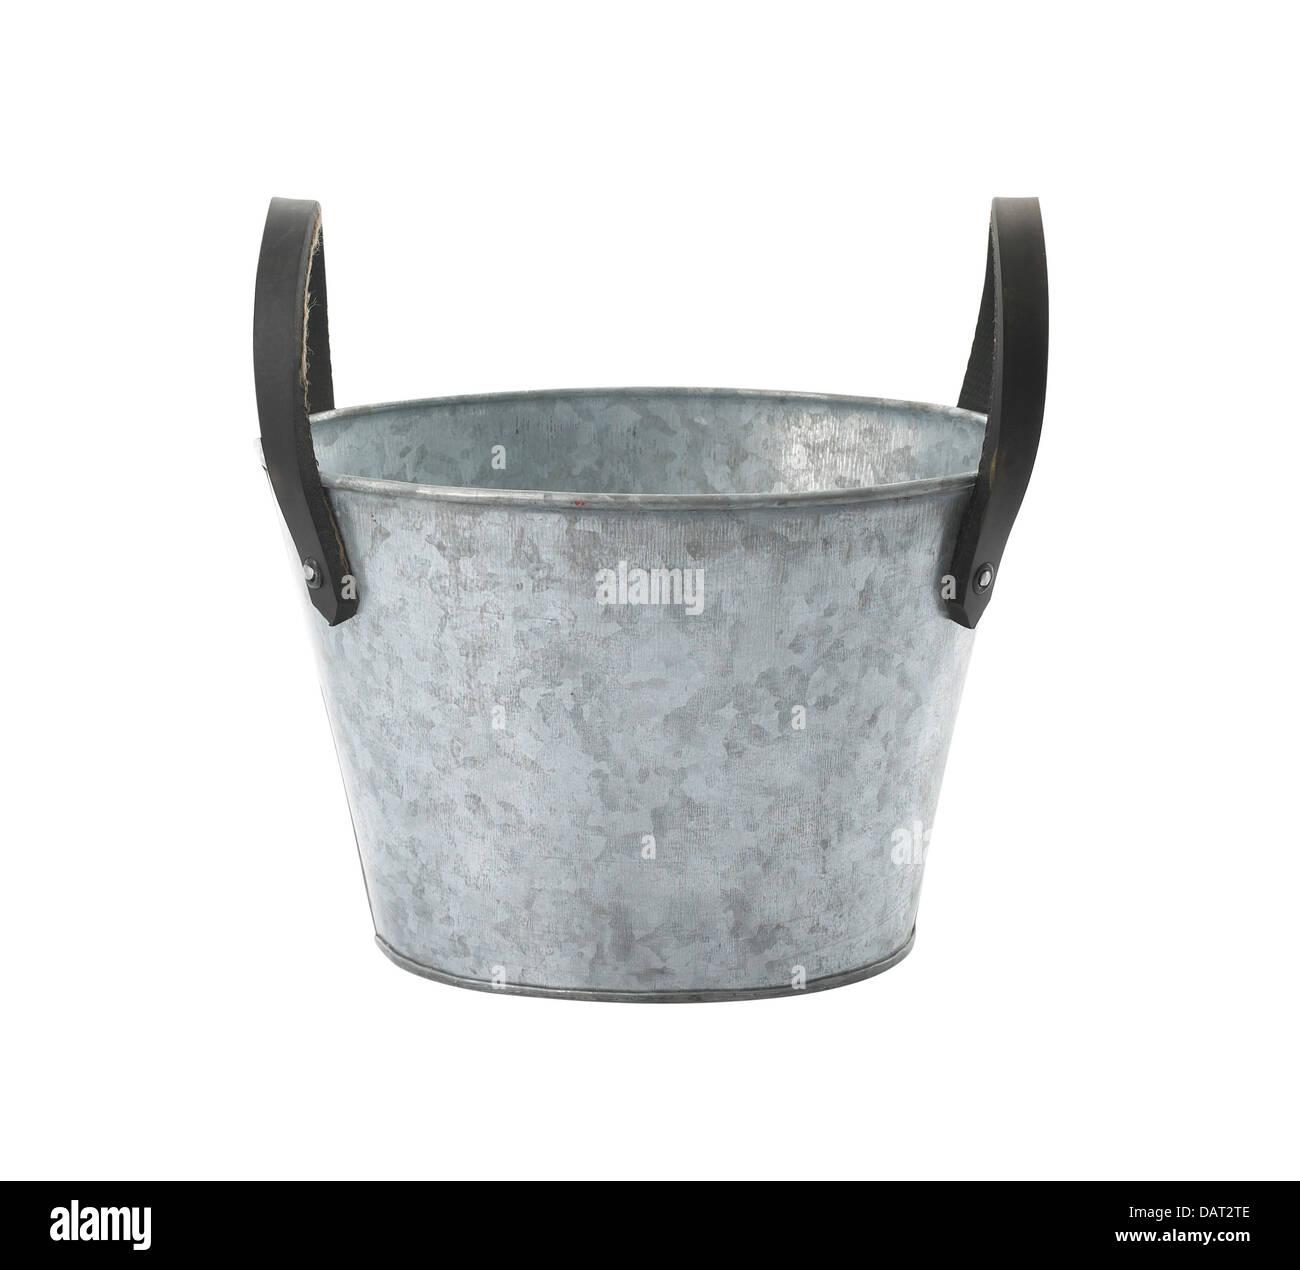 Galvanized pot - Stock Image